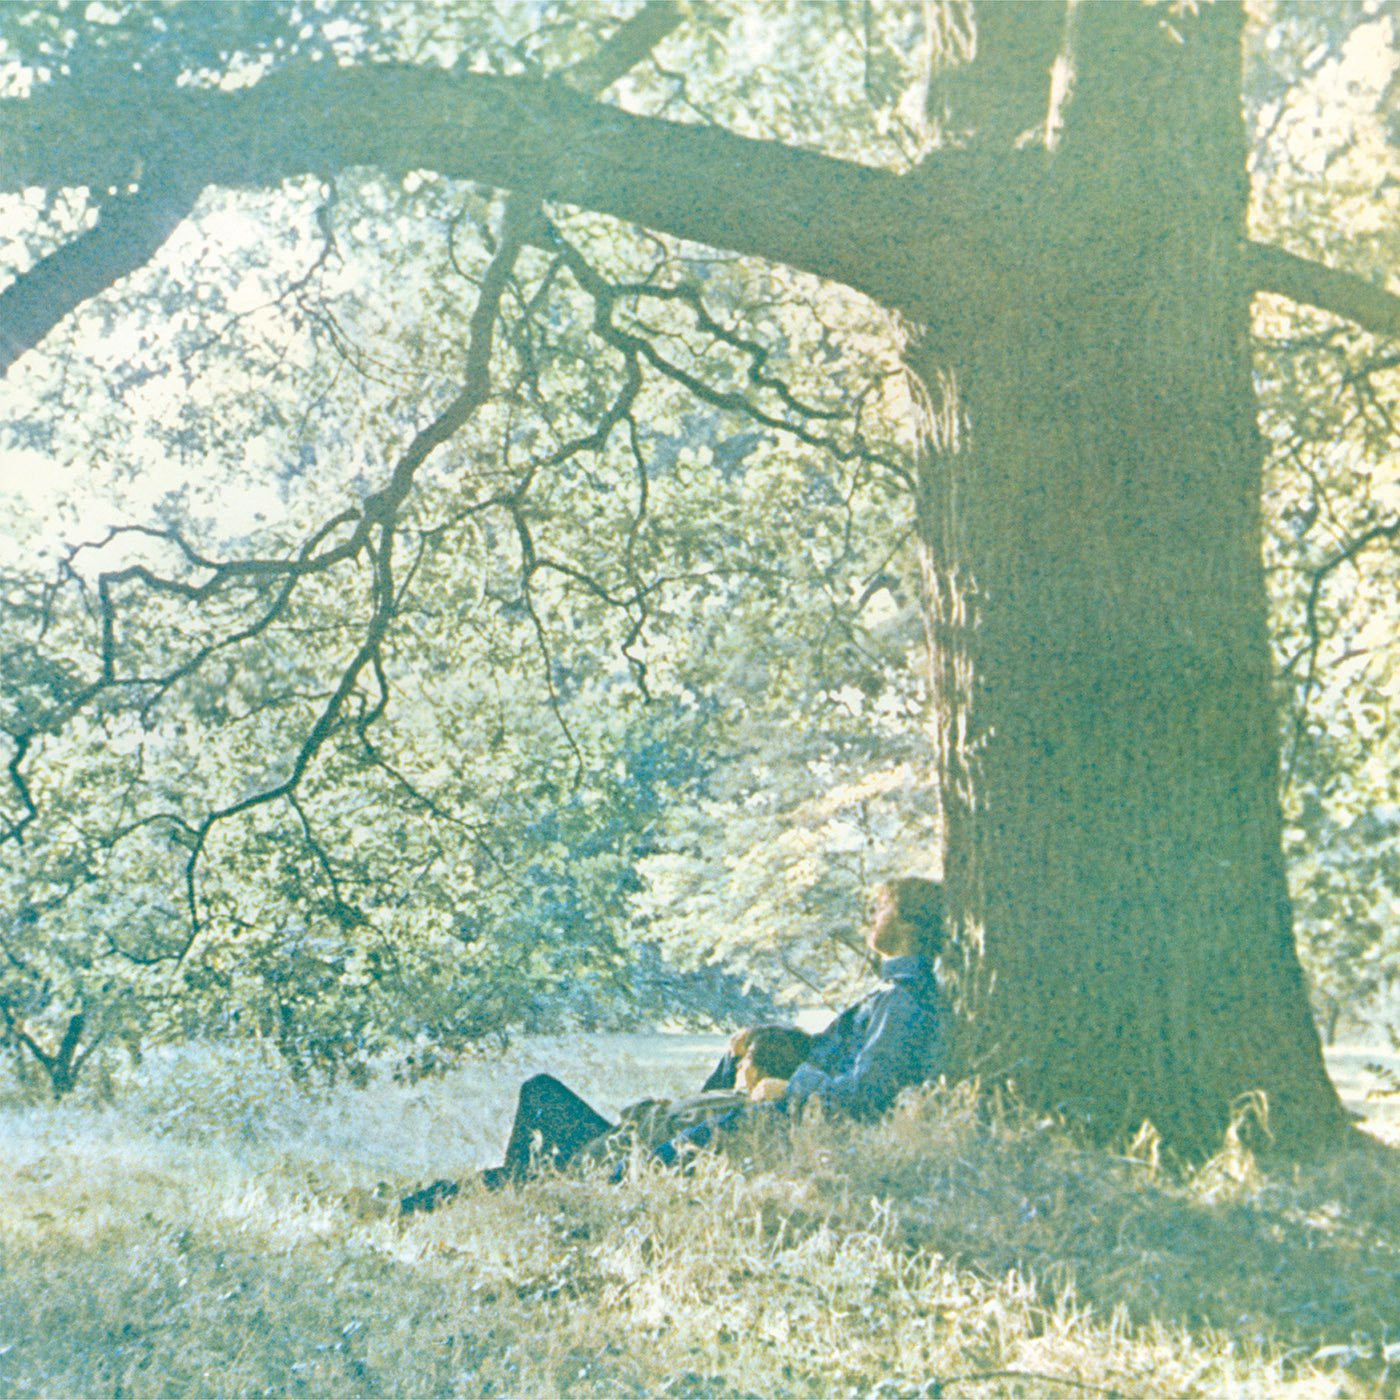 John Lennon - Plastic Ono Band [LTD 6xCD+2xBlueRay+Book]